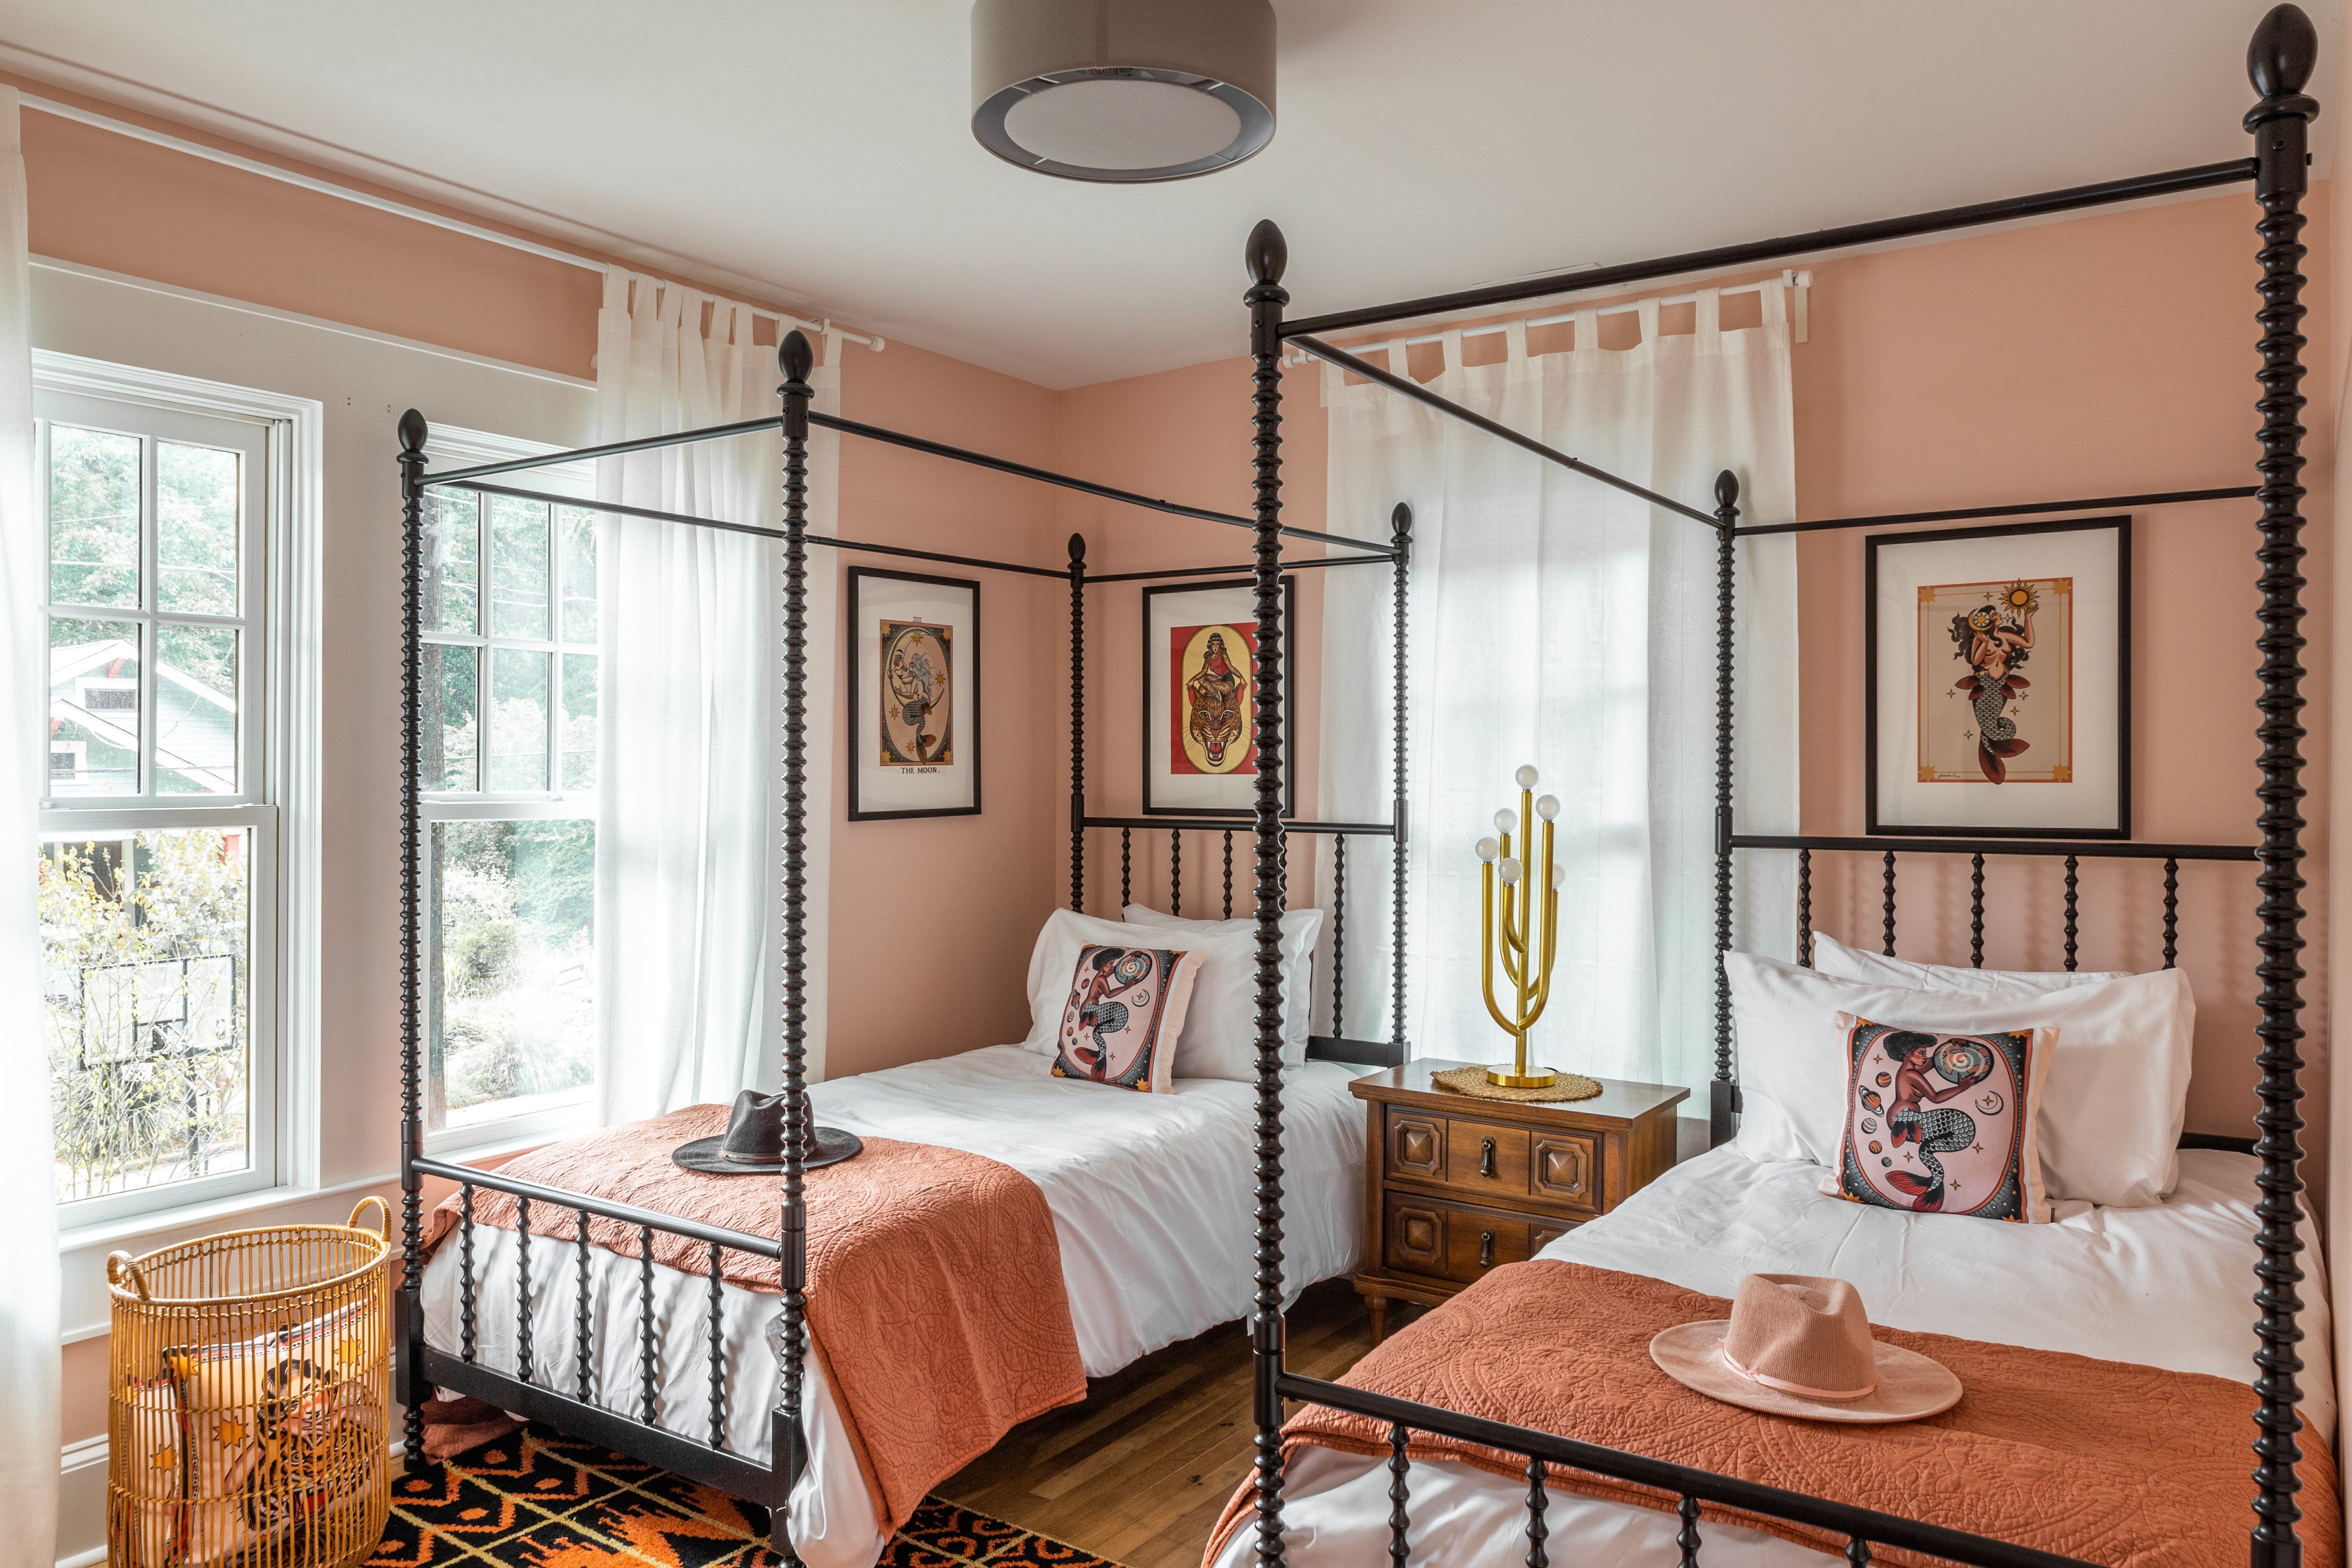 18 twin bedroom 20210721-IMG_0292-HDR.jpg